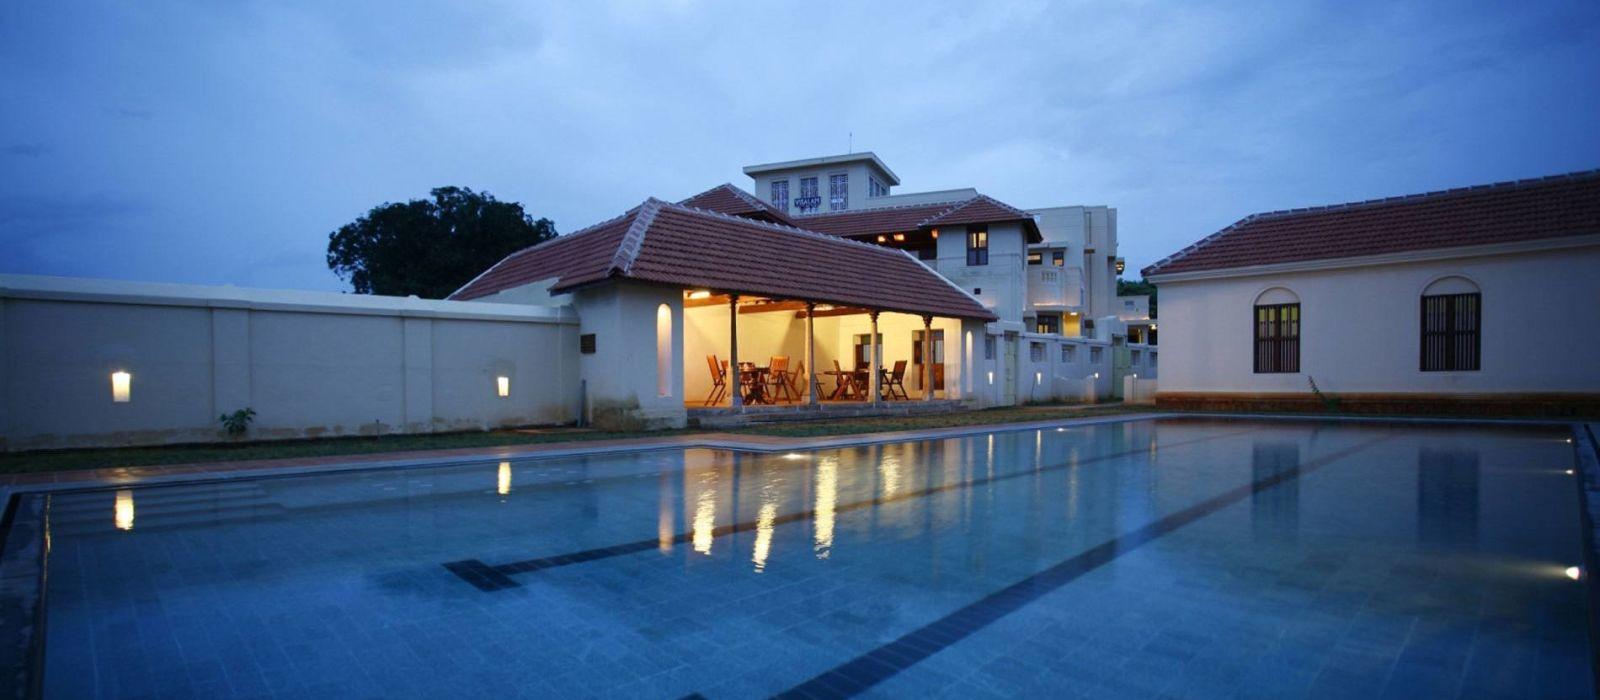 Hotel Visalam Südindien